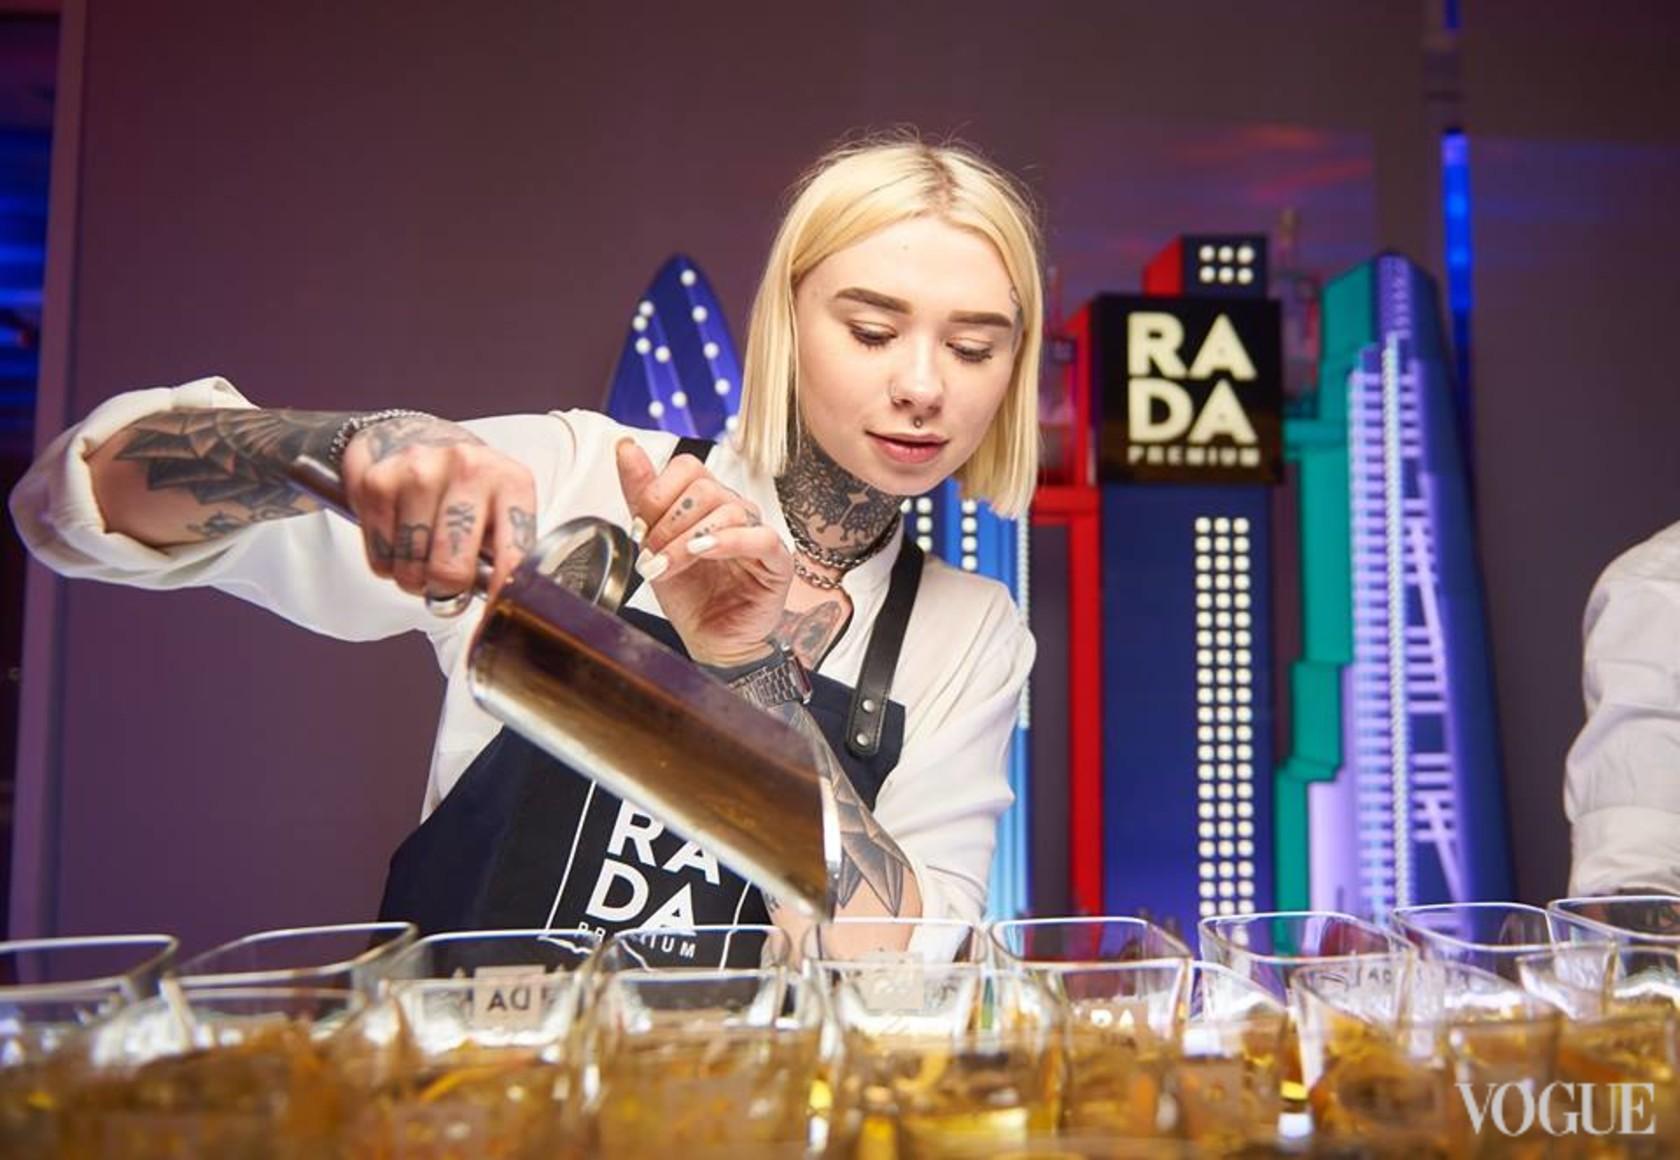 Гостей угощают коктейлями ТМ RADA Premium